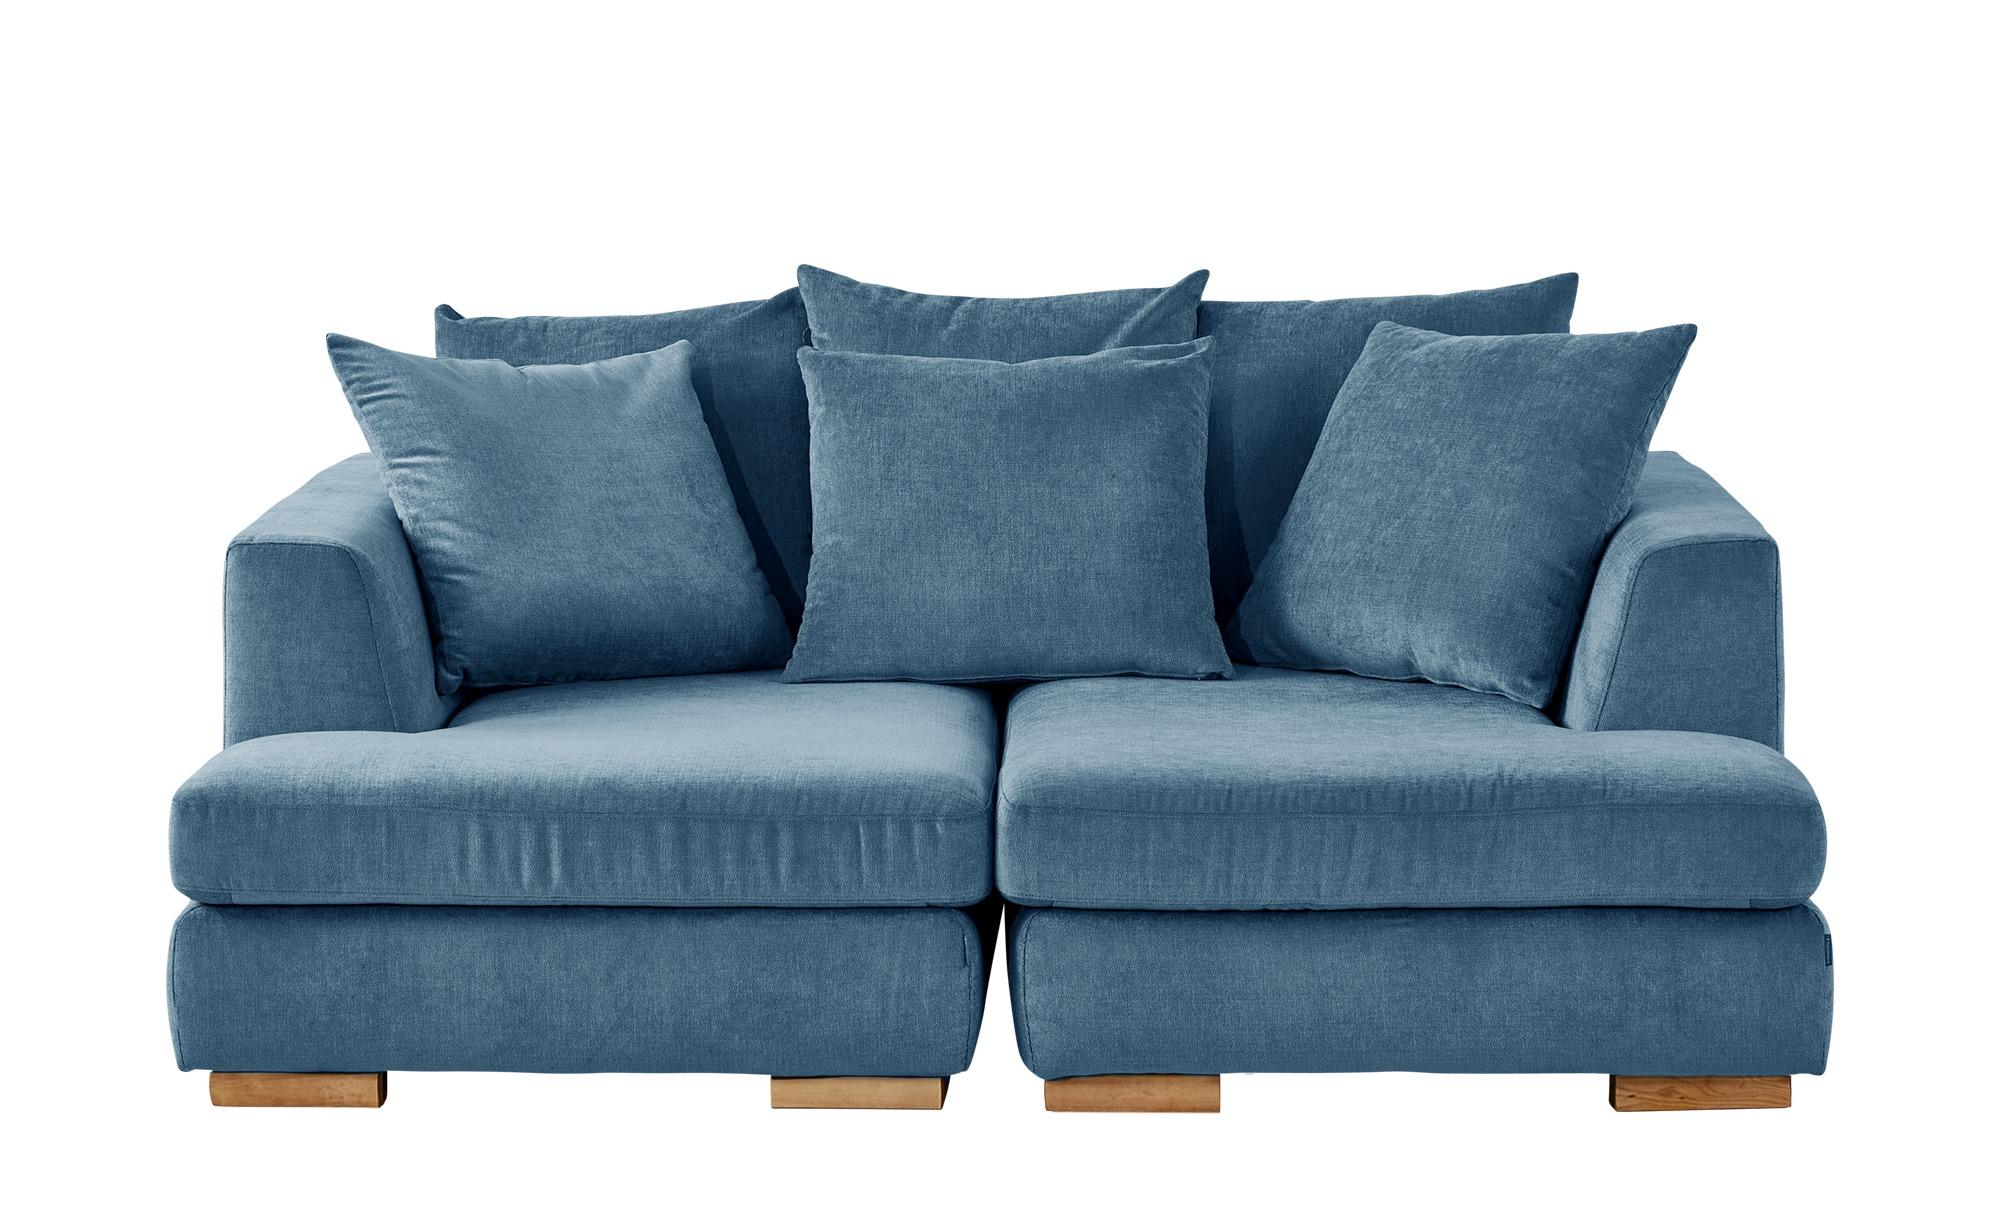 SOHO Loveseat blau - Webstoff Paulina ¦ Maße (cm): B: 202 H: 80 T: 156 Polstermöbel > Sofas > 2-Sitzer - Höffner